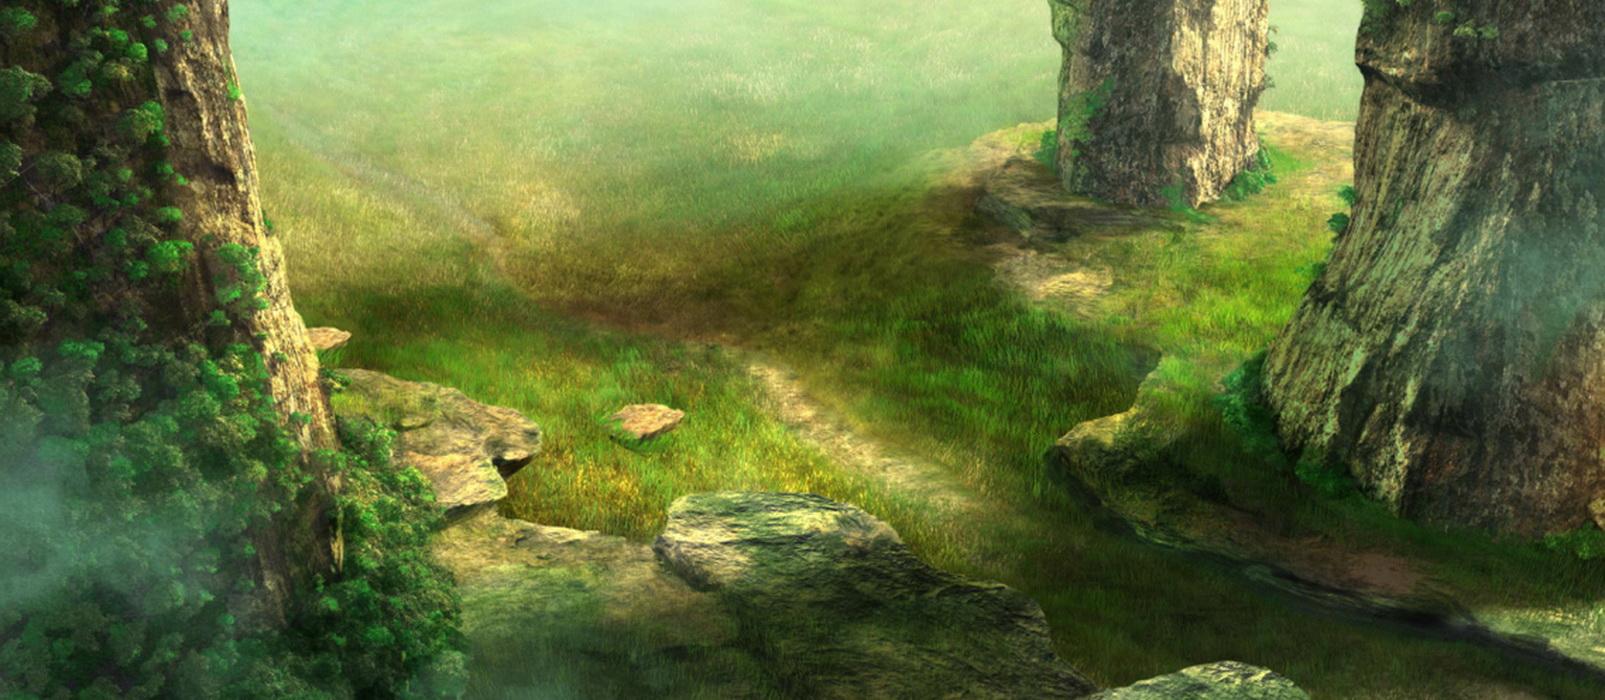 environment_04_resize